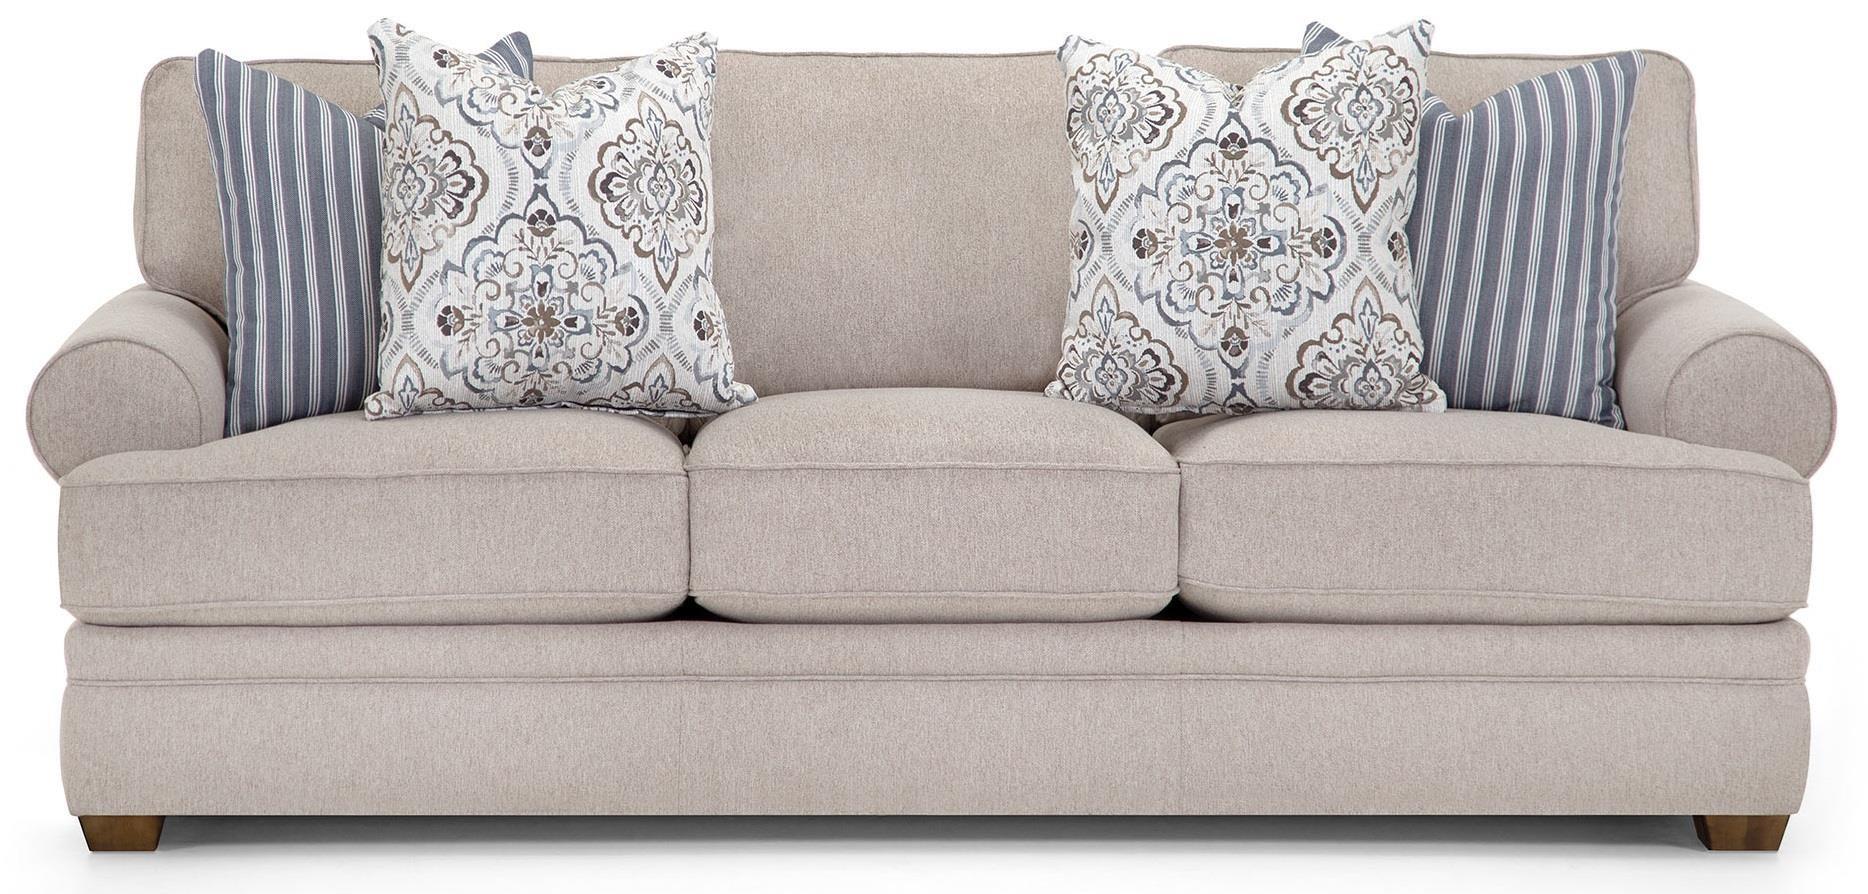 Anniston Sofa at Bennett's Furniture and Mattresses